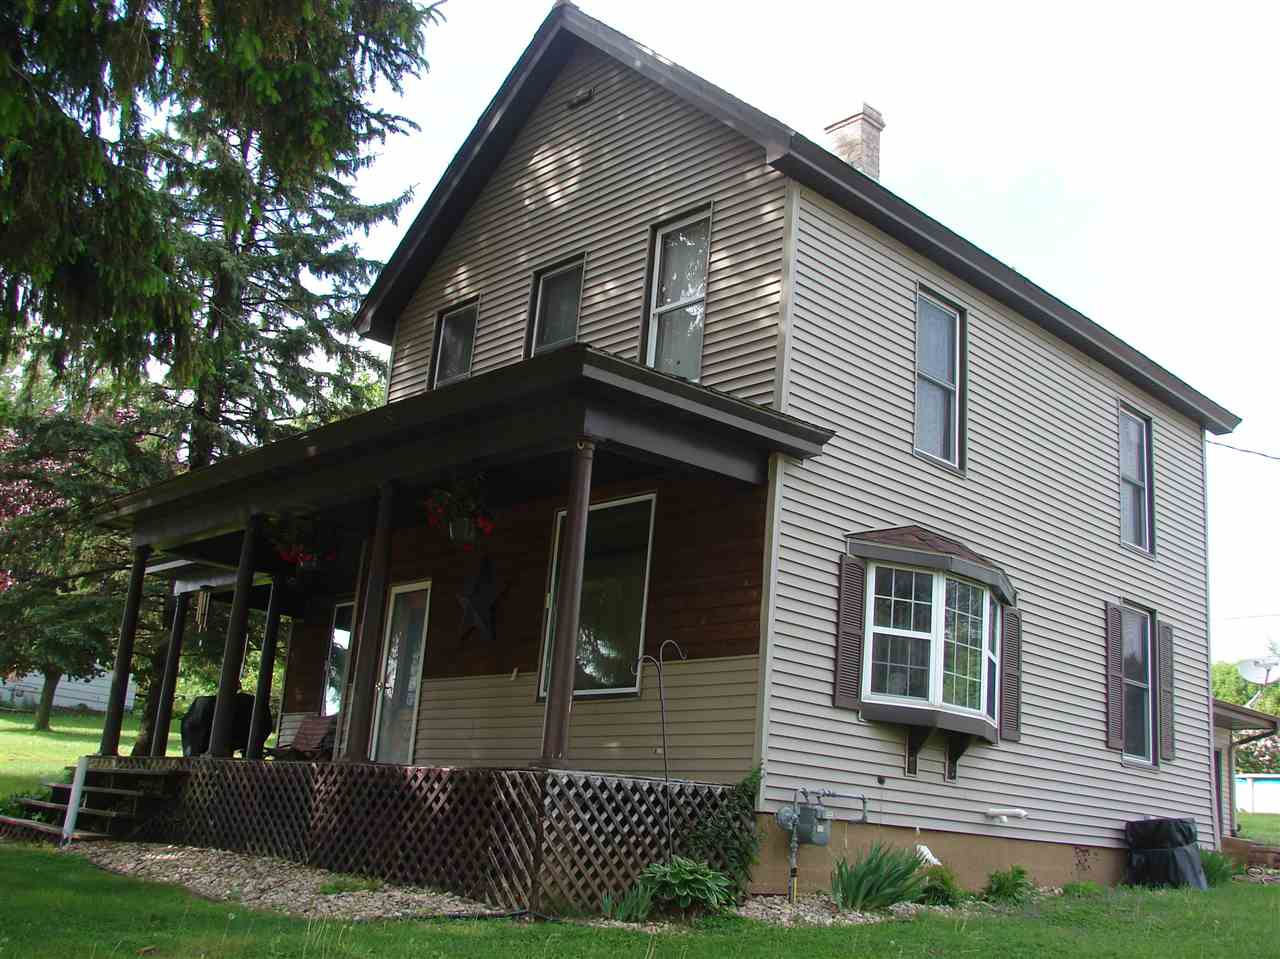 422 Main St, Linden, WI 53553